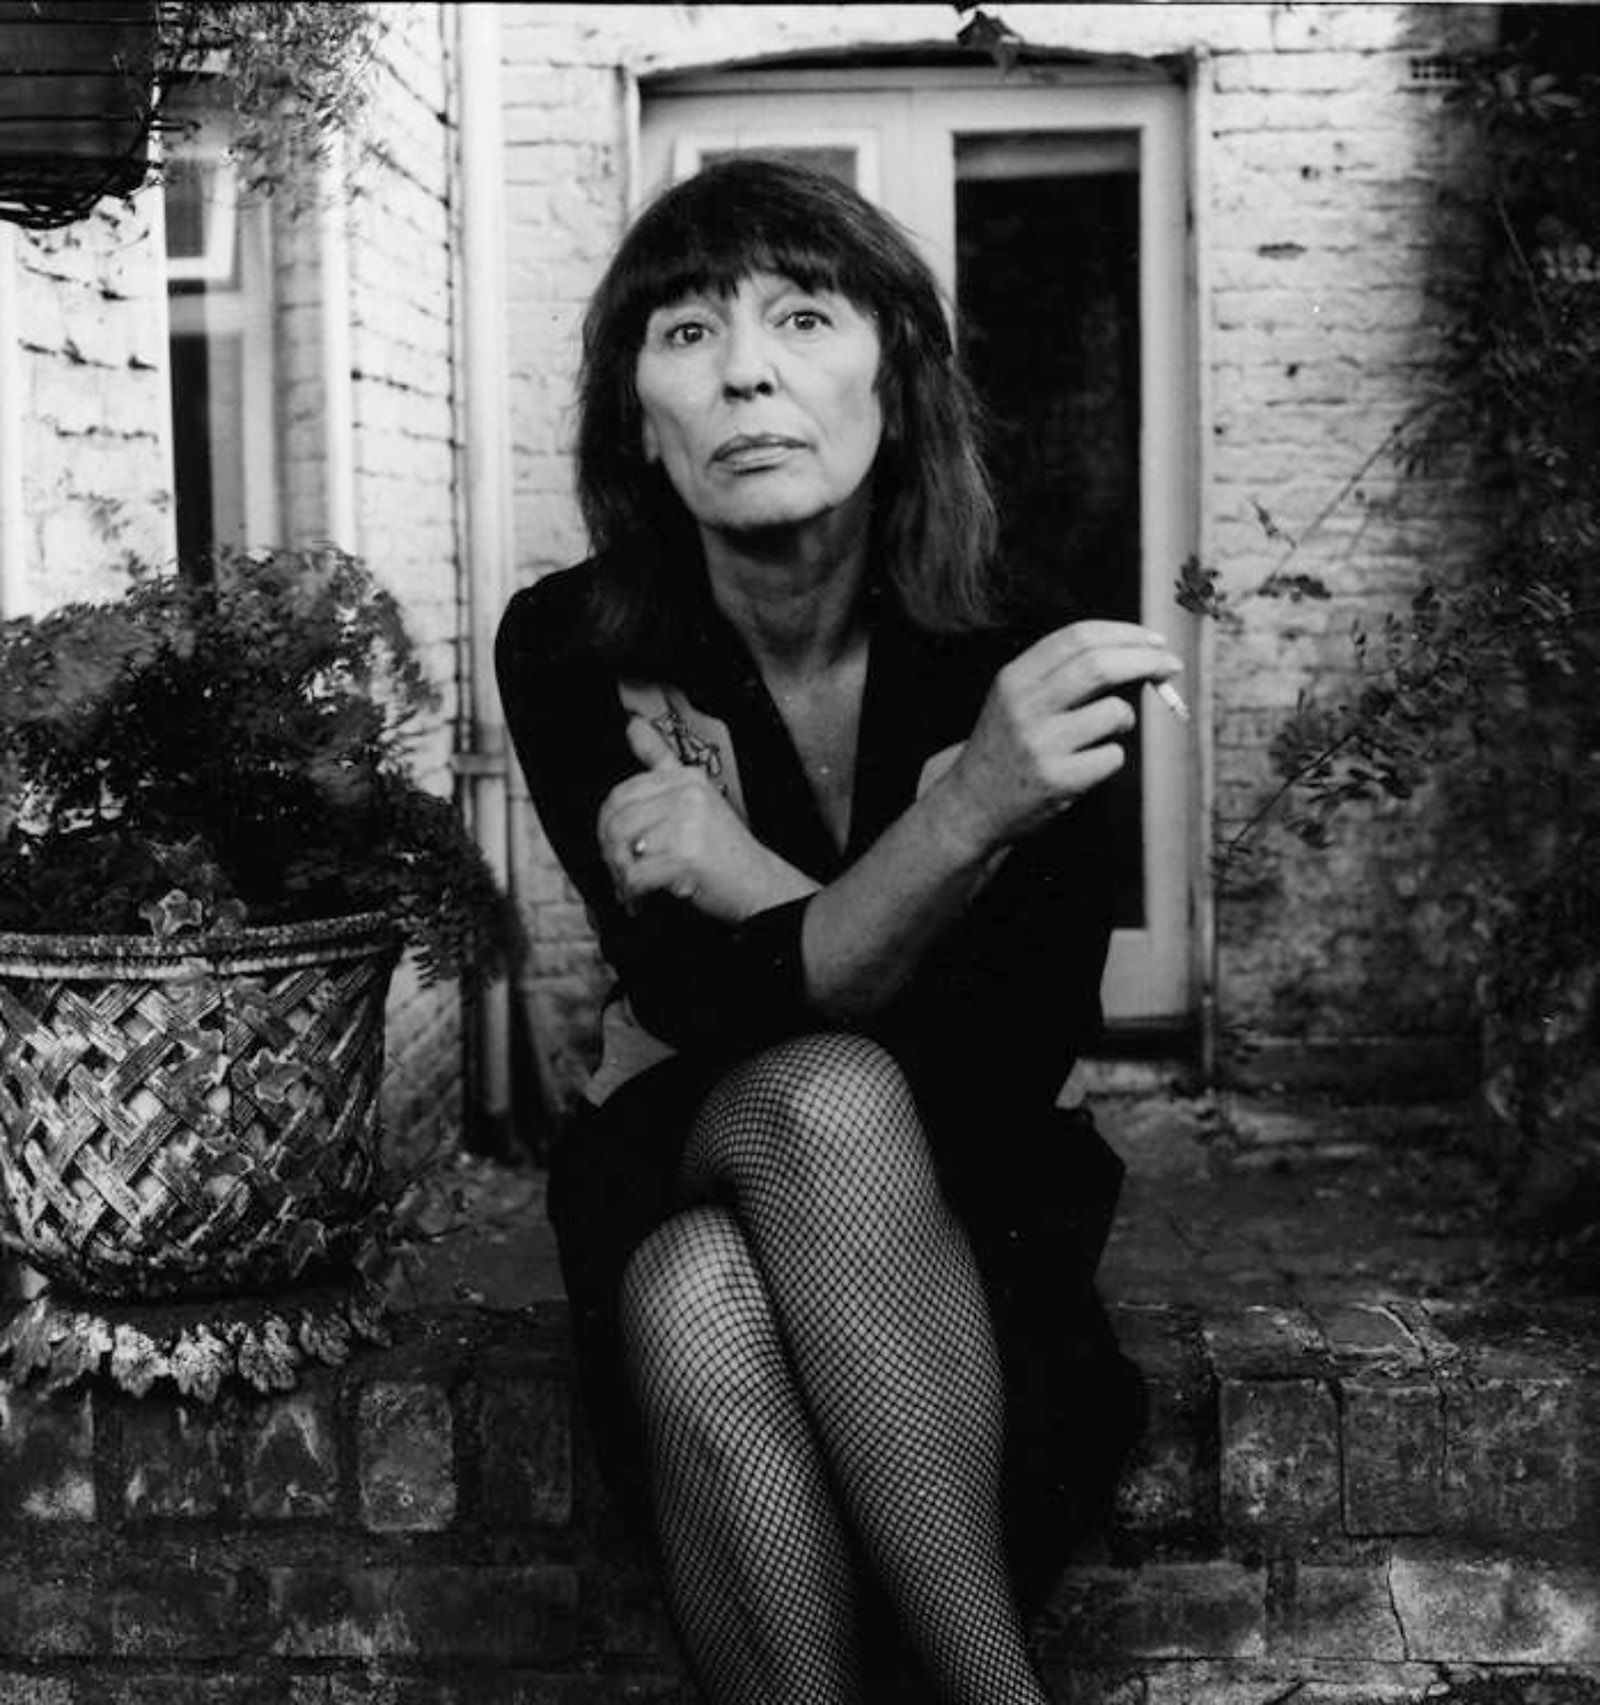 Beryl Bainbridge at her house in Camden Town, London, 1989